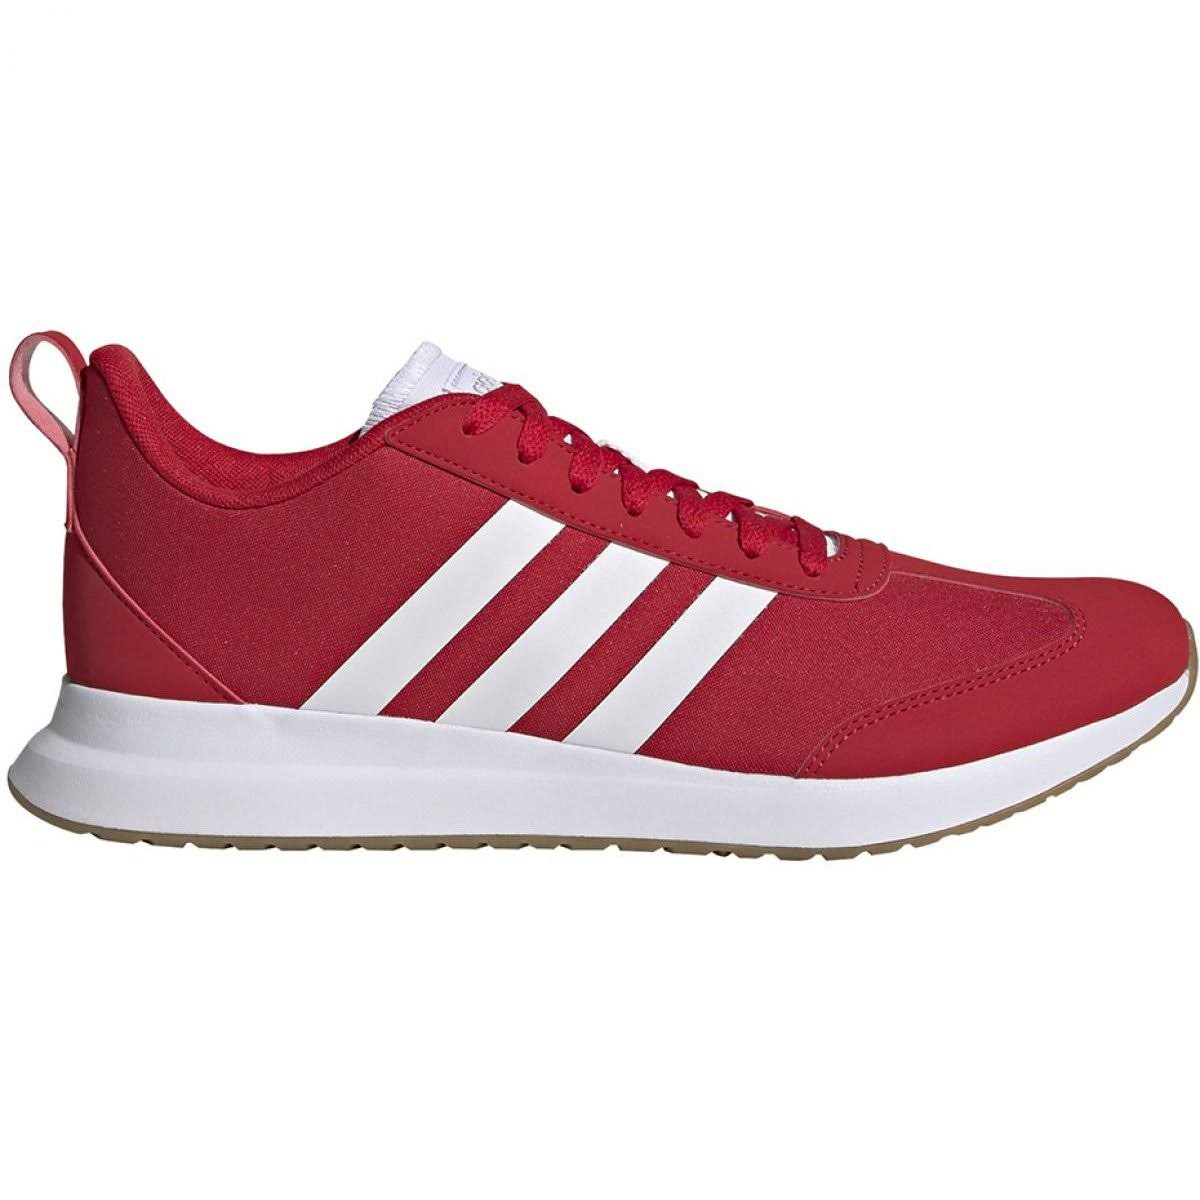 Adidas Run60S M EG8689 shoes red